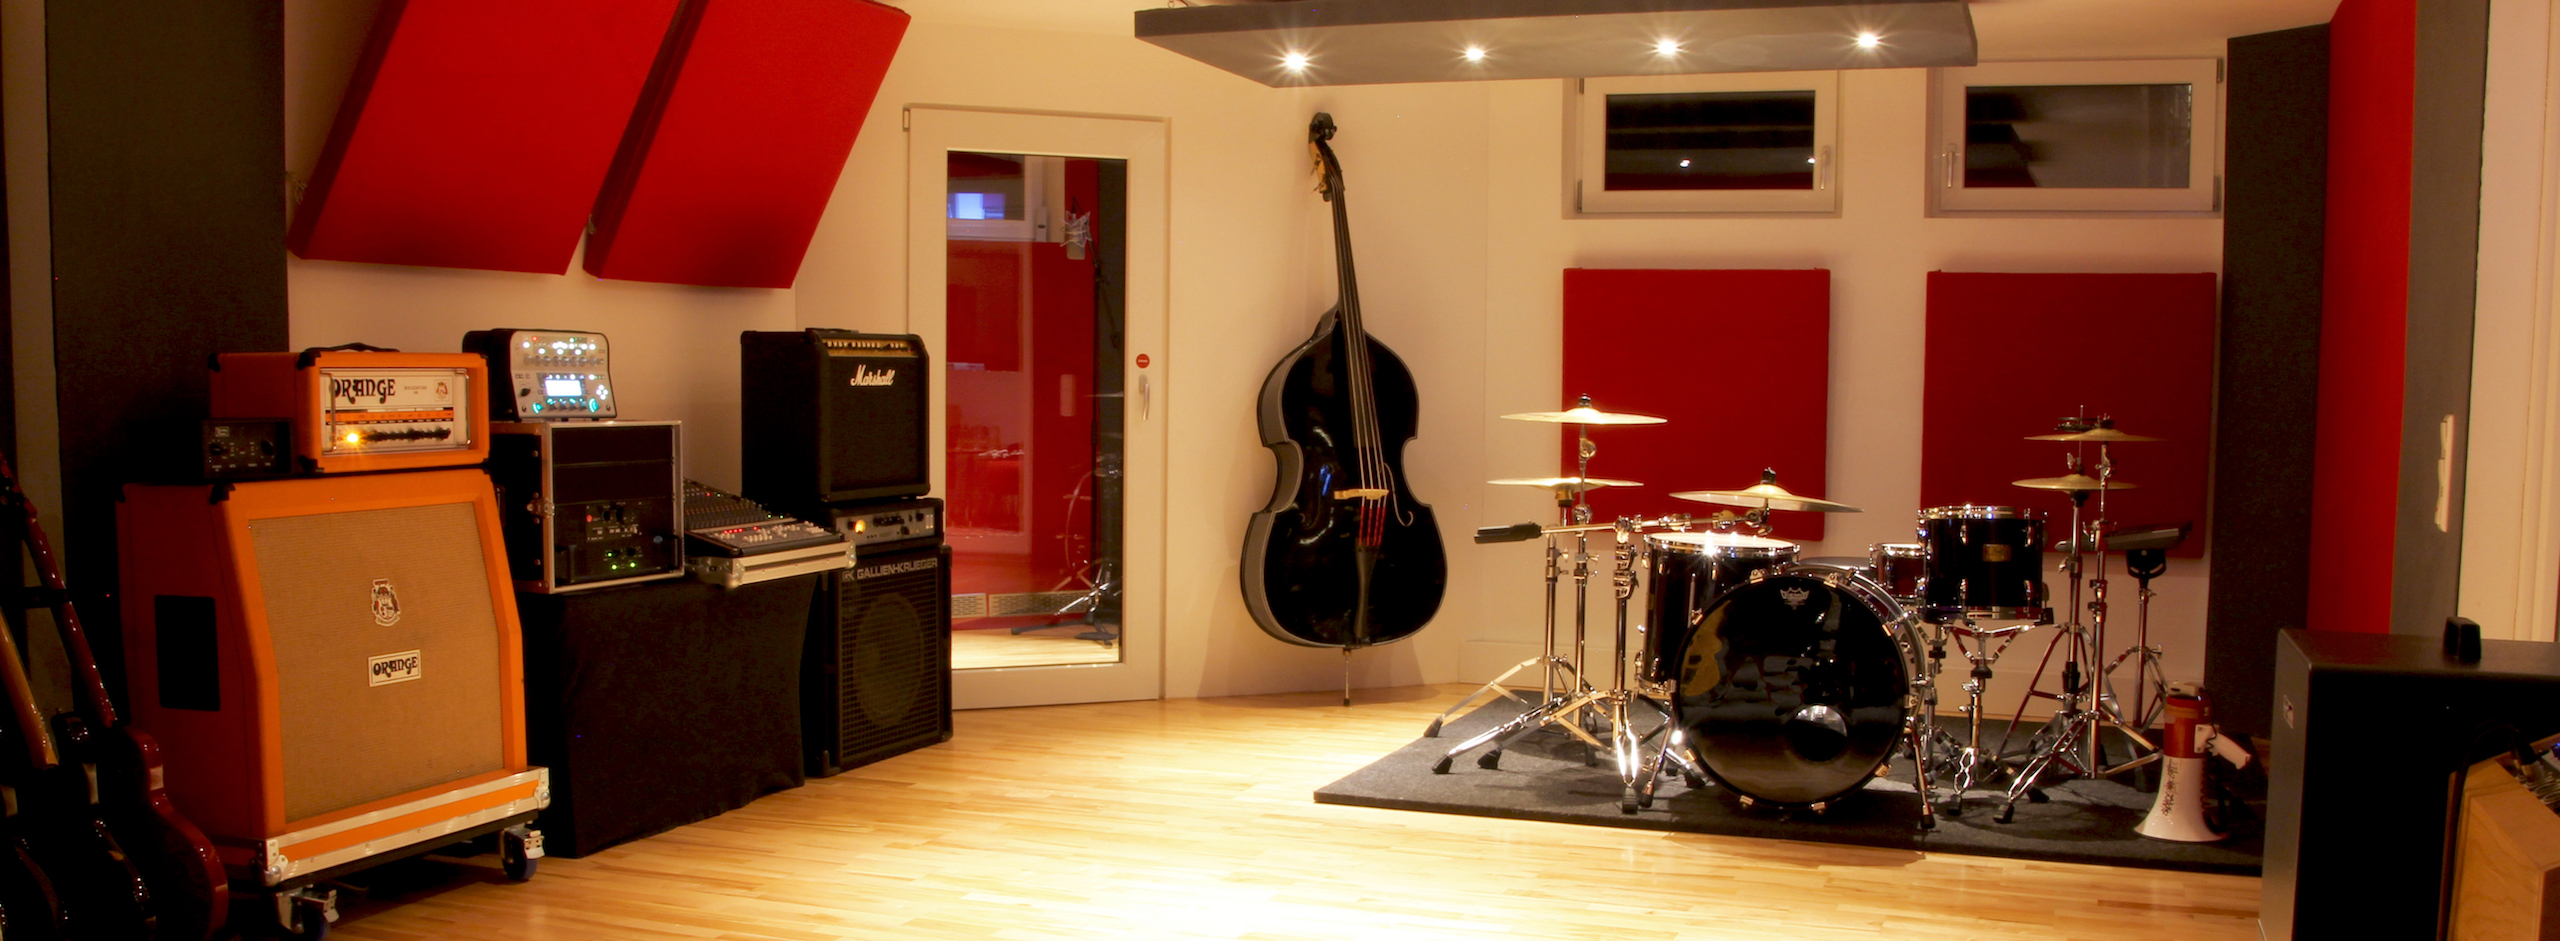 Hicktown_records_studio_1_youtube